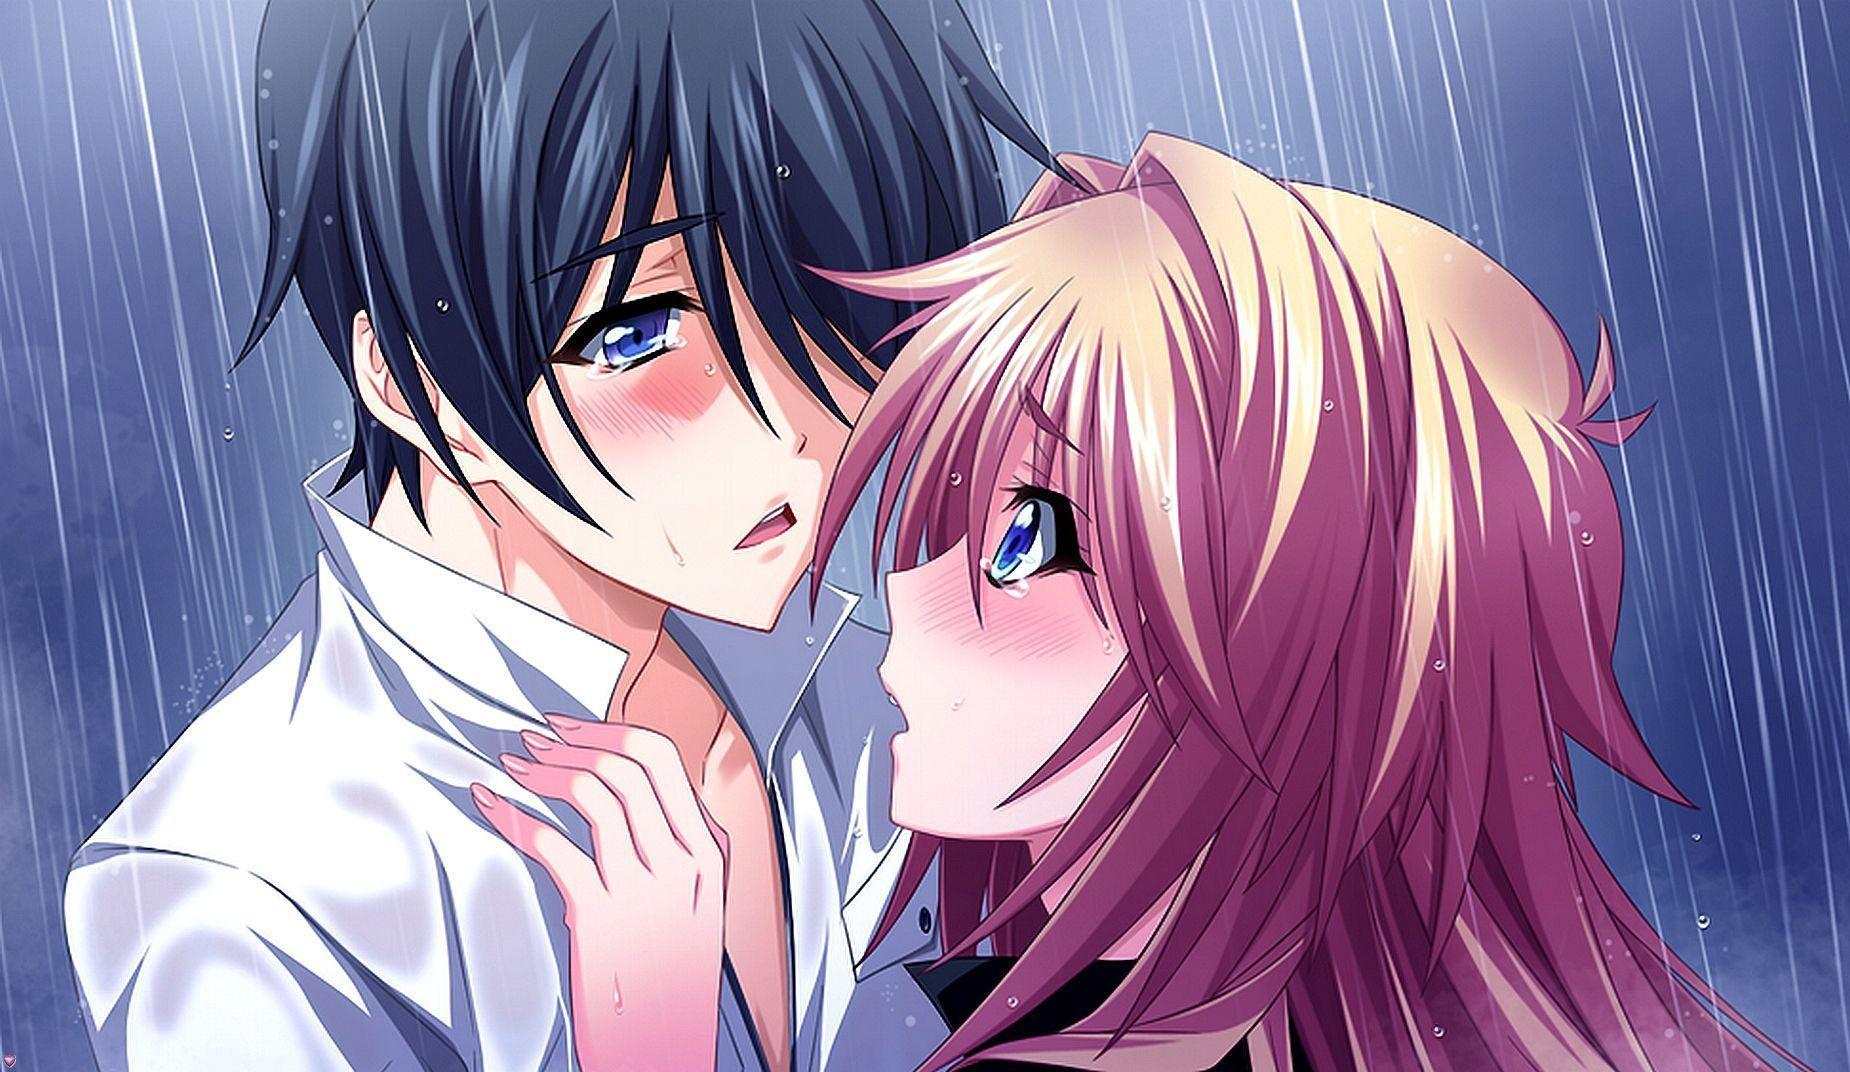 Manga sous la pluie - Image manga couple ...